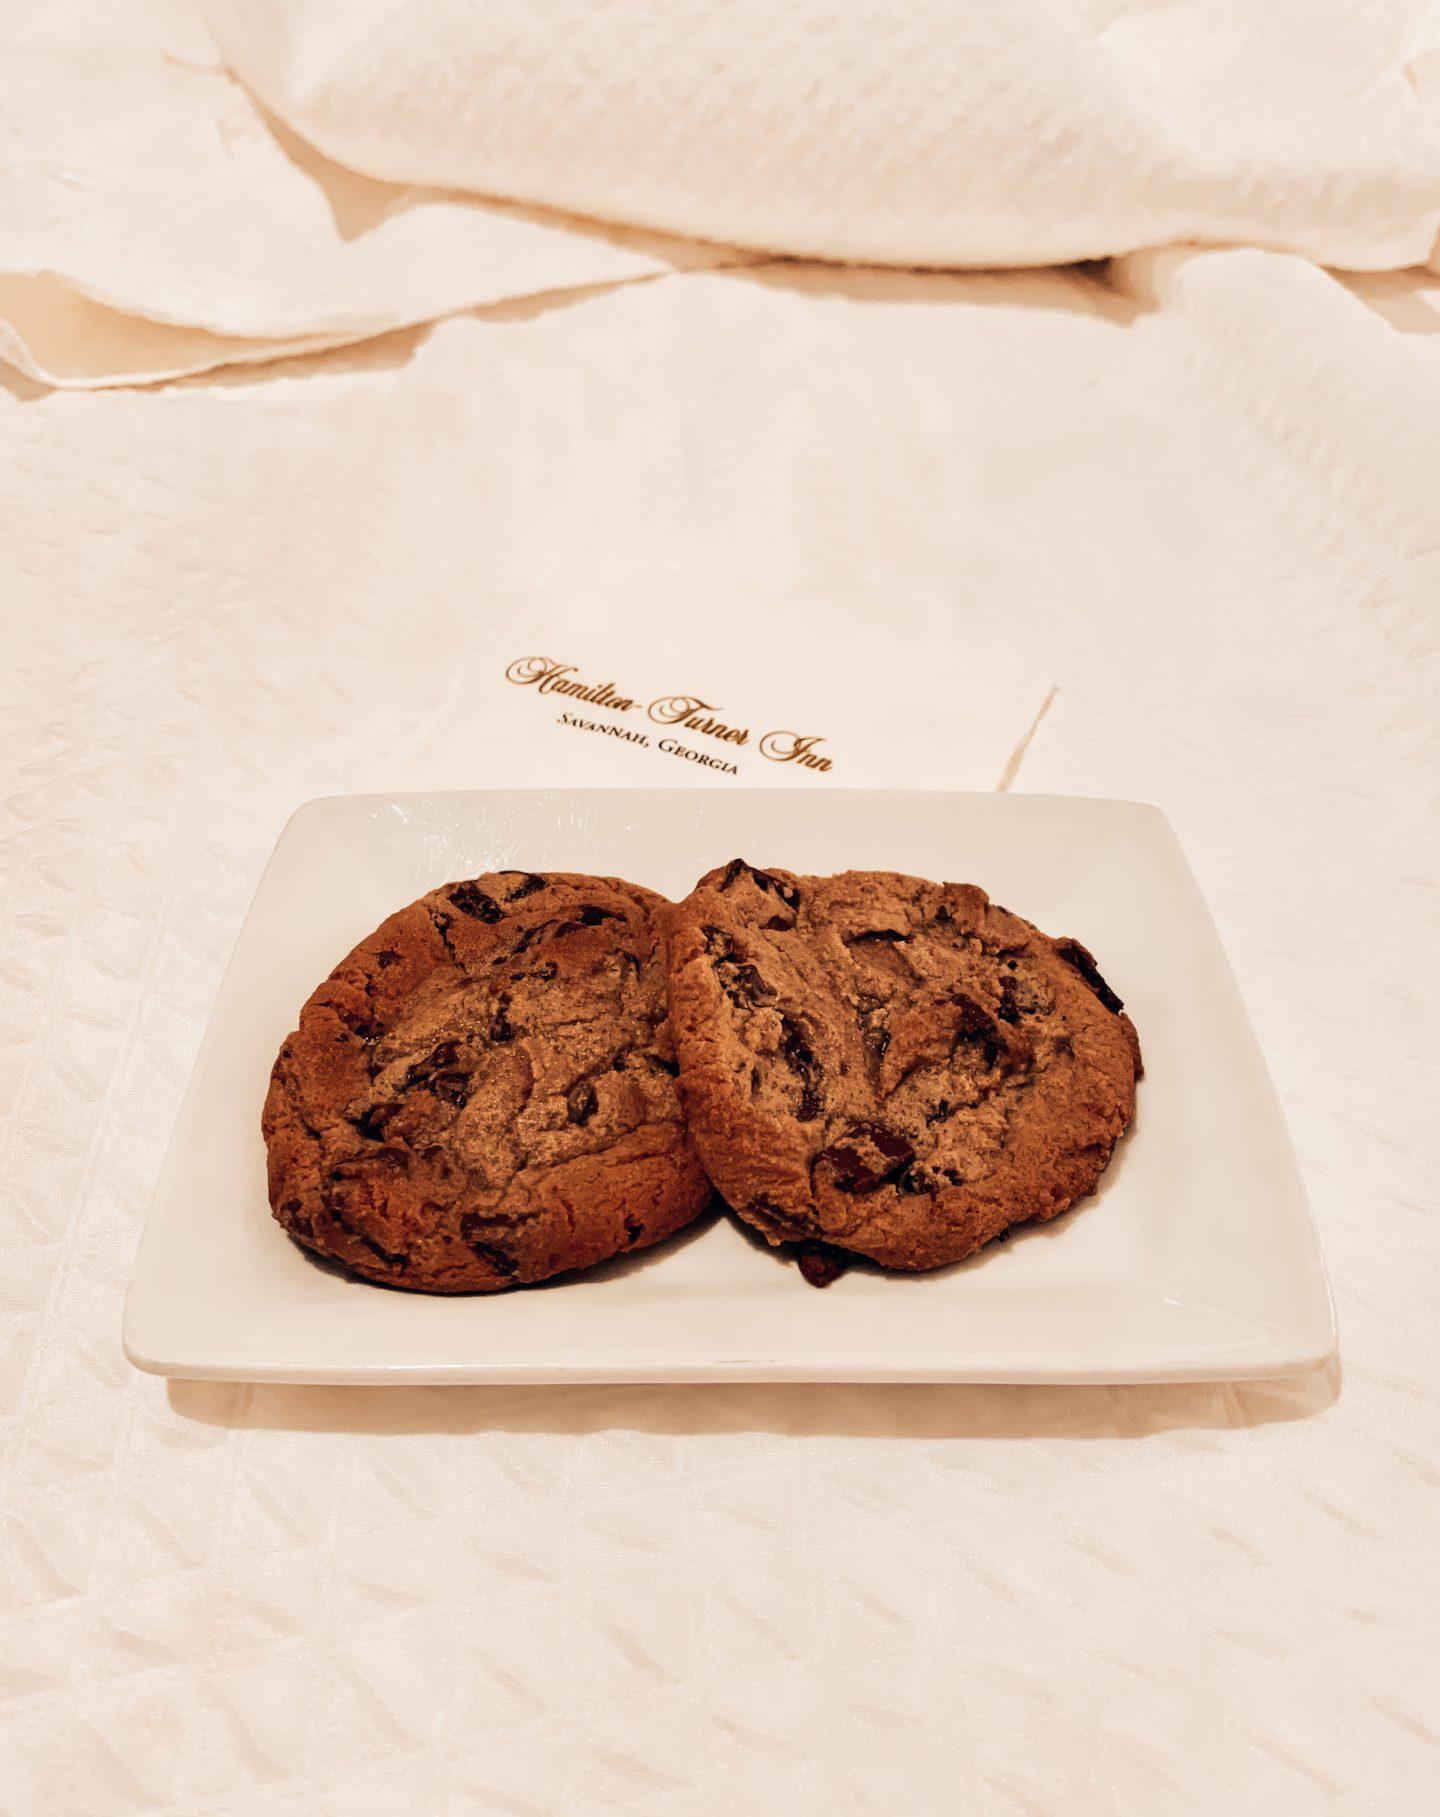 Freshly baked cookies at the Hamilton Turner Inn